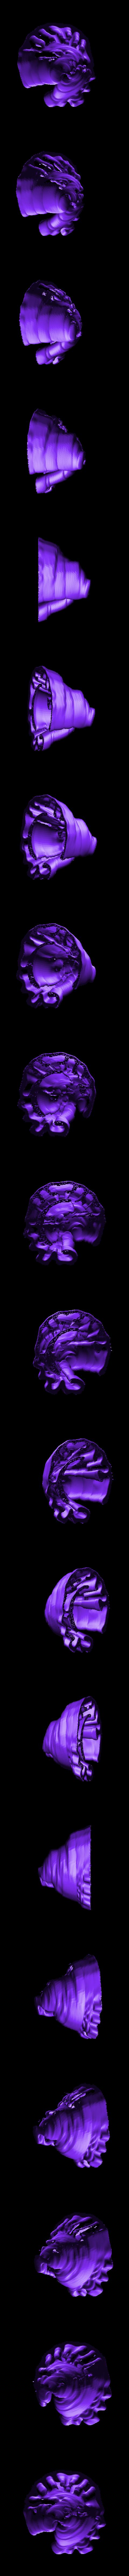 cave1.stl Download free STL file Weird terrain collection • 3D printer object, ferjerez3d